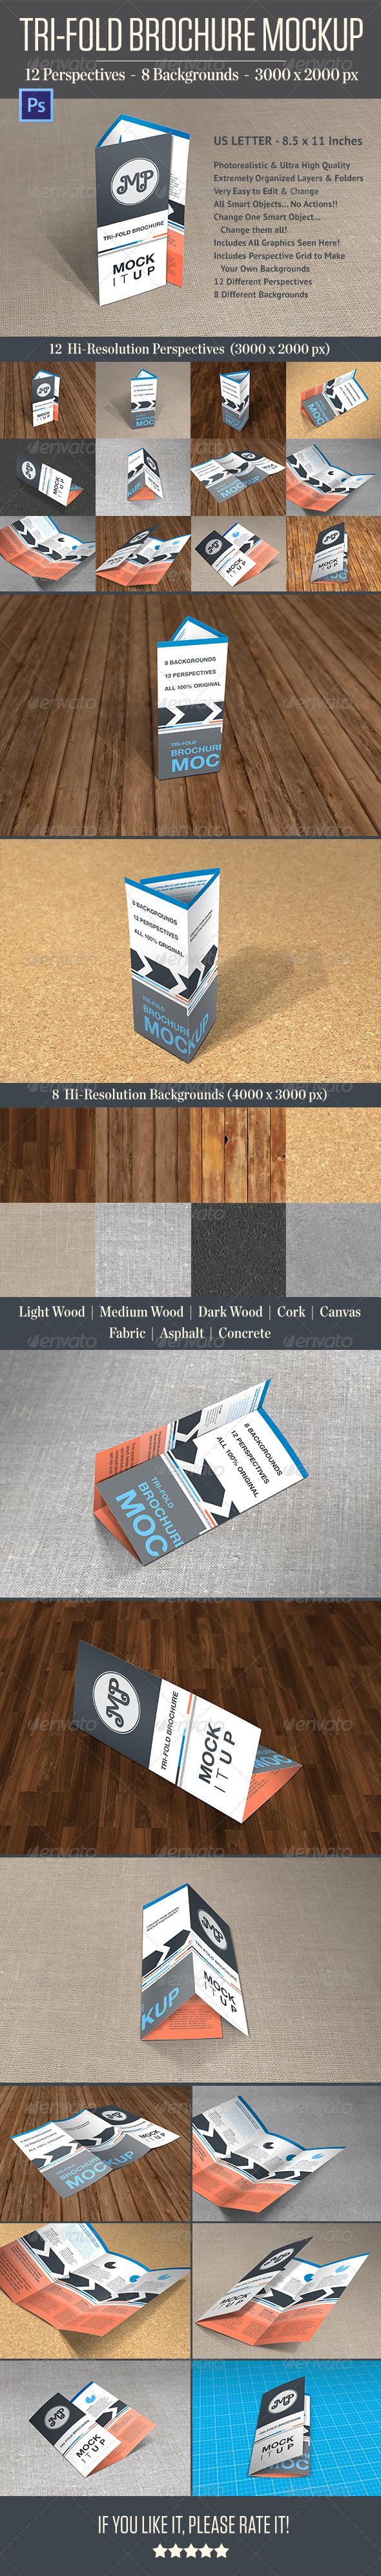 GraphicRiver Photorealistic Trifold Brochure Mockup 4433771